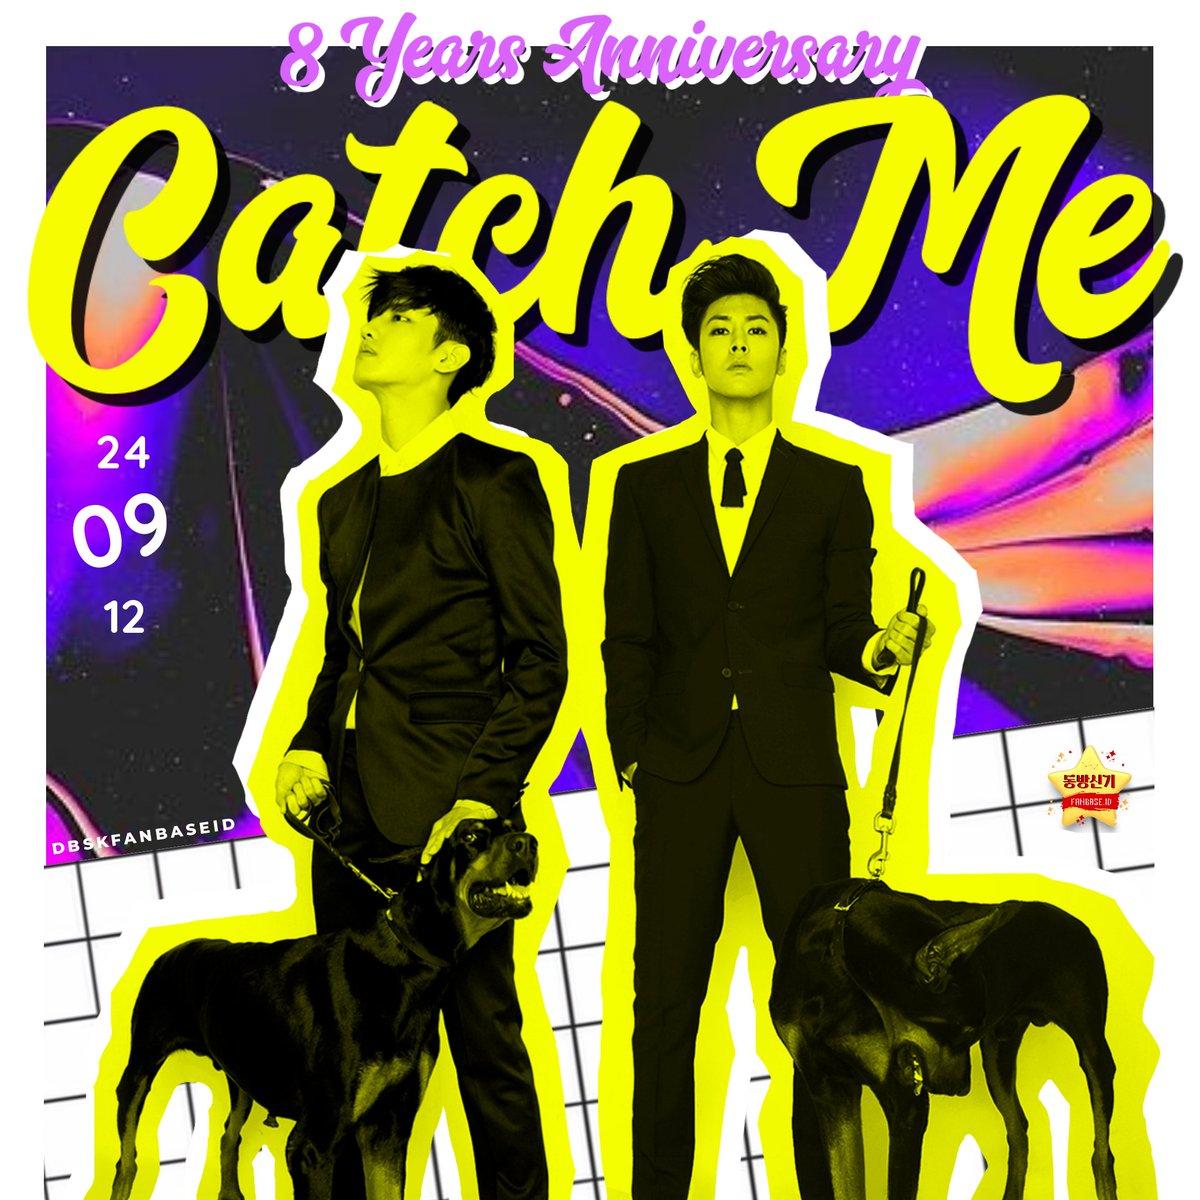 ❤️ 8th Years Anniversary of 'CATCH ME' ❤️ TVXQ! 6th Album 🔥  #TVXQ #동방신기 #東方神起 #유노윤호 #UKNOW #최강창민 #MAX #CATCHME 🔥🔥 https://t.co/53z5thN5TF